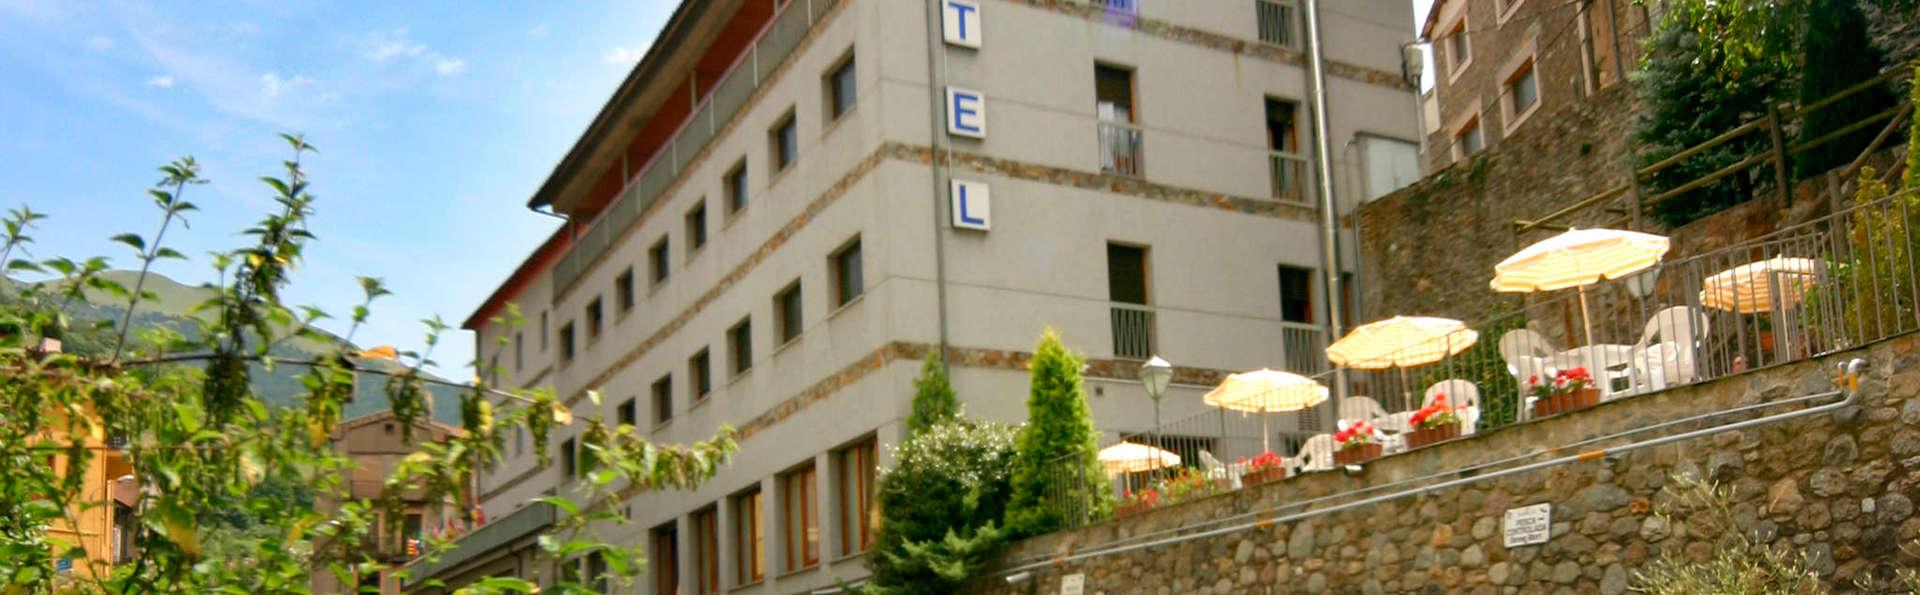 Hotel Sant Antoni - EDIT_front.jpg